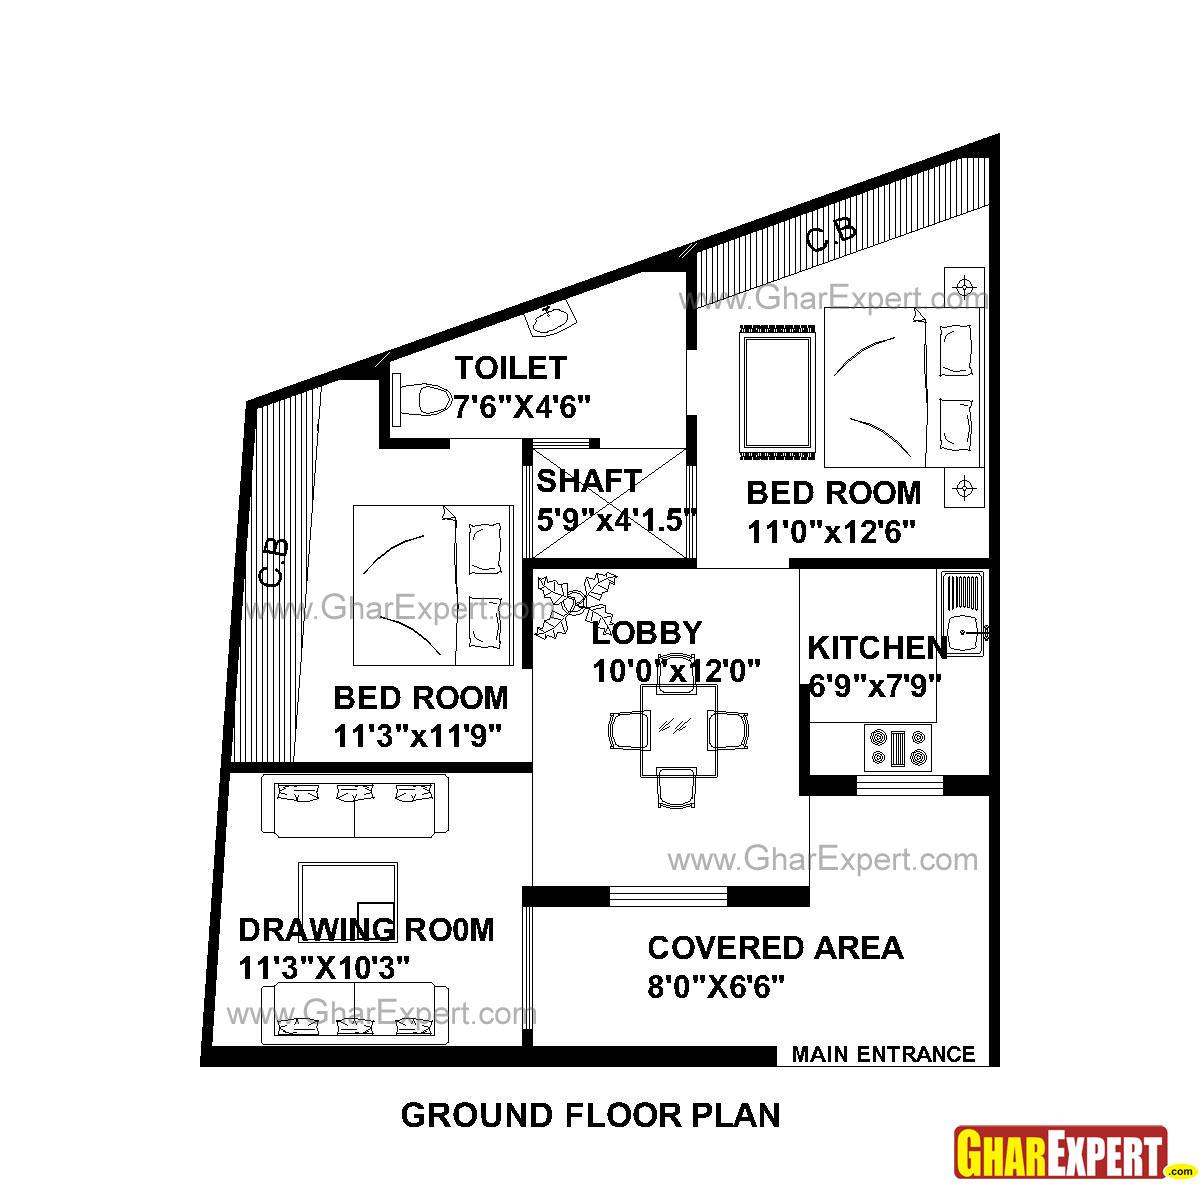 House Plan for 30 Feet by 35 Feet plot (Plot Size 117